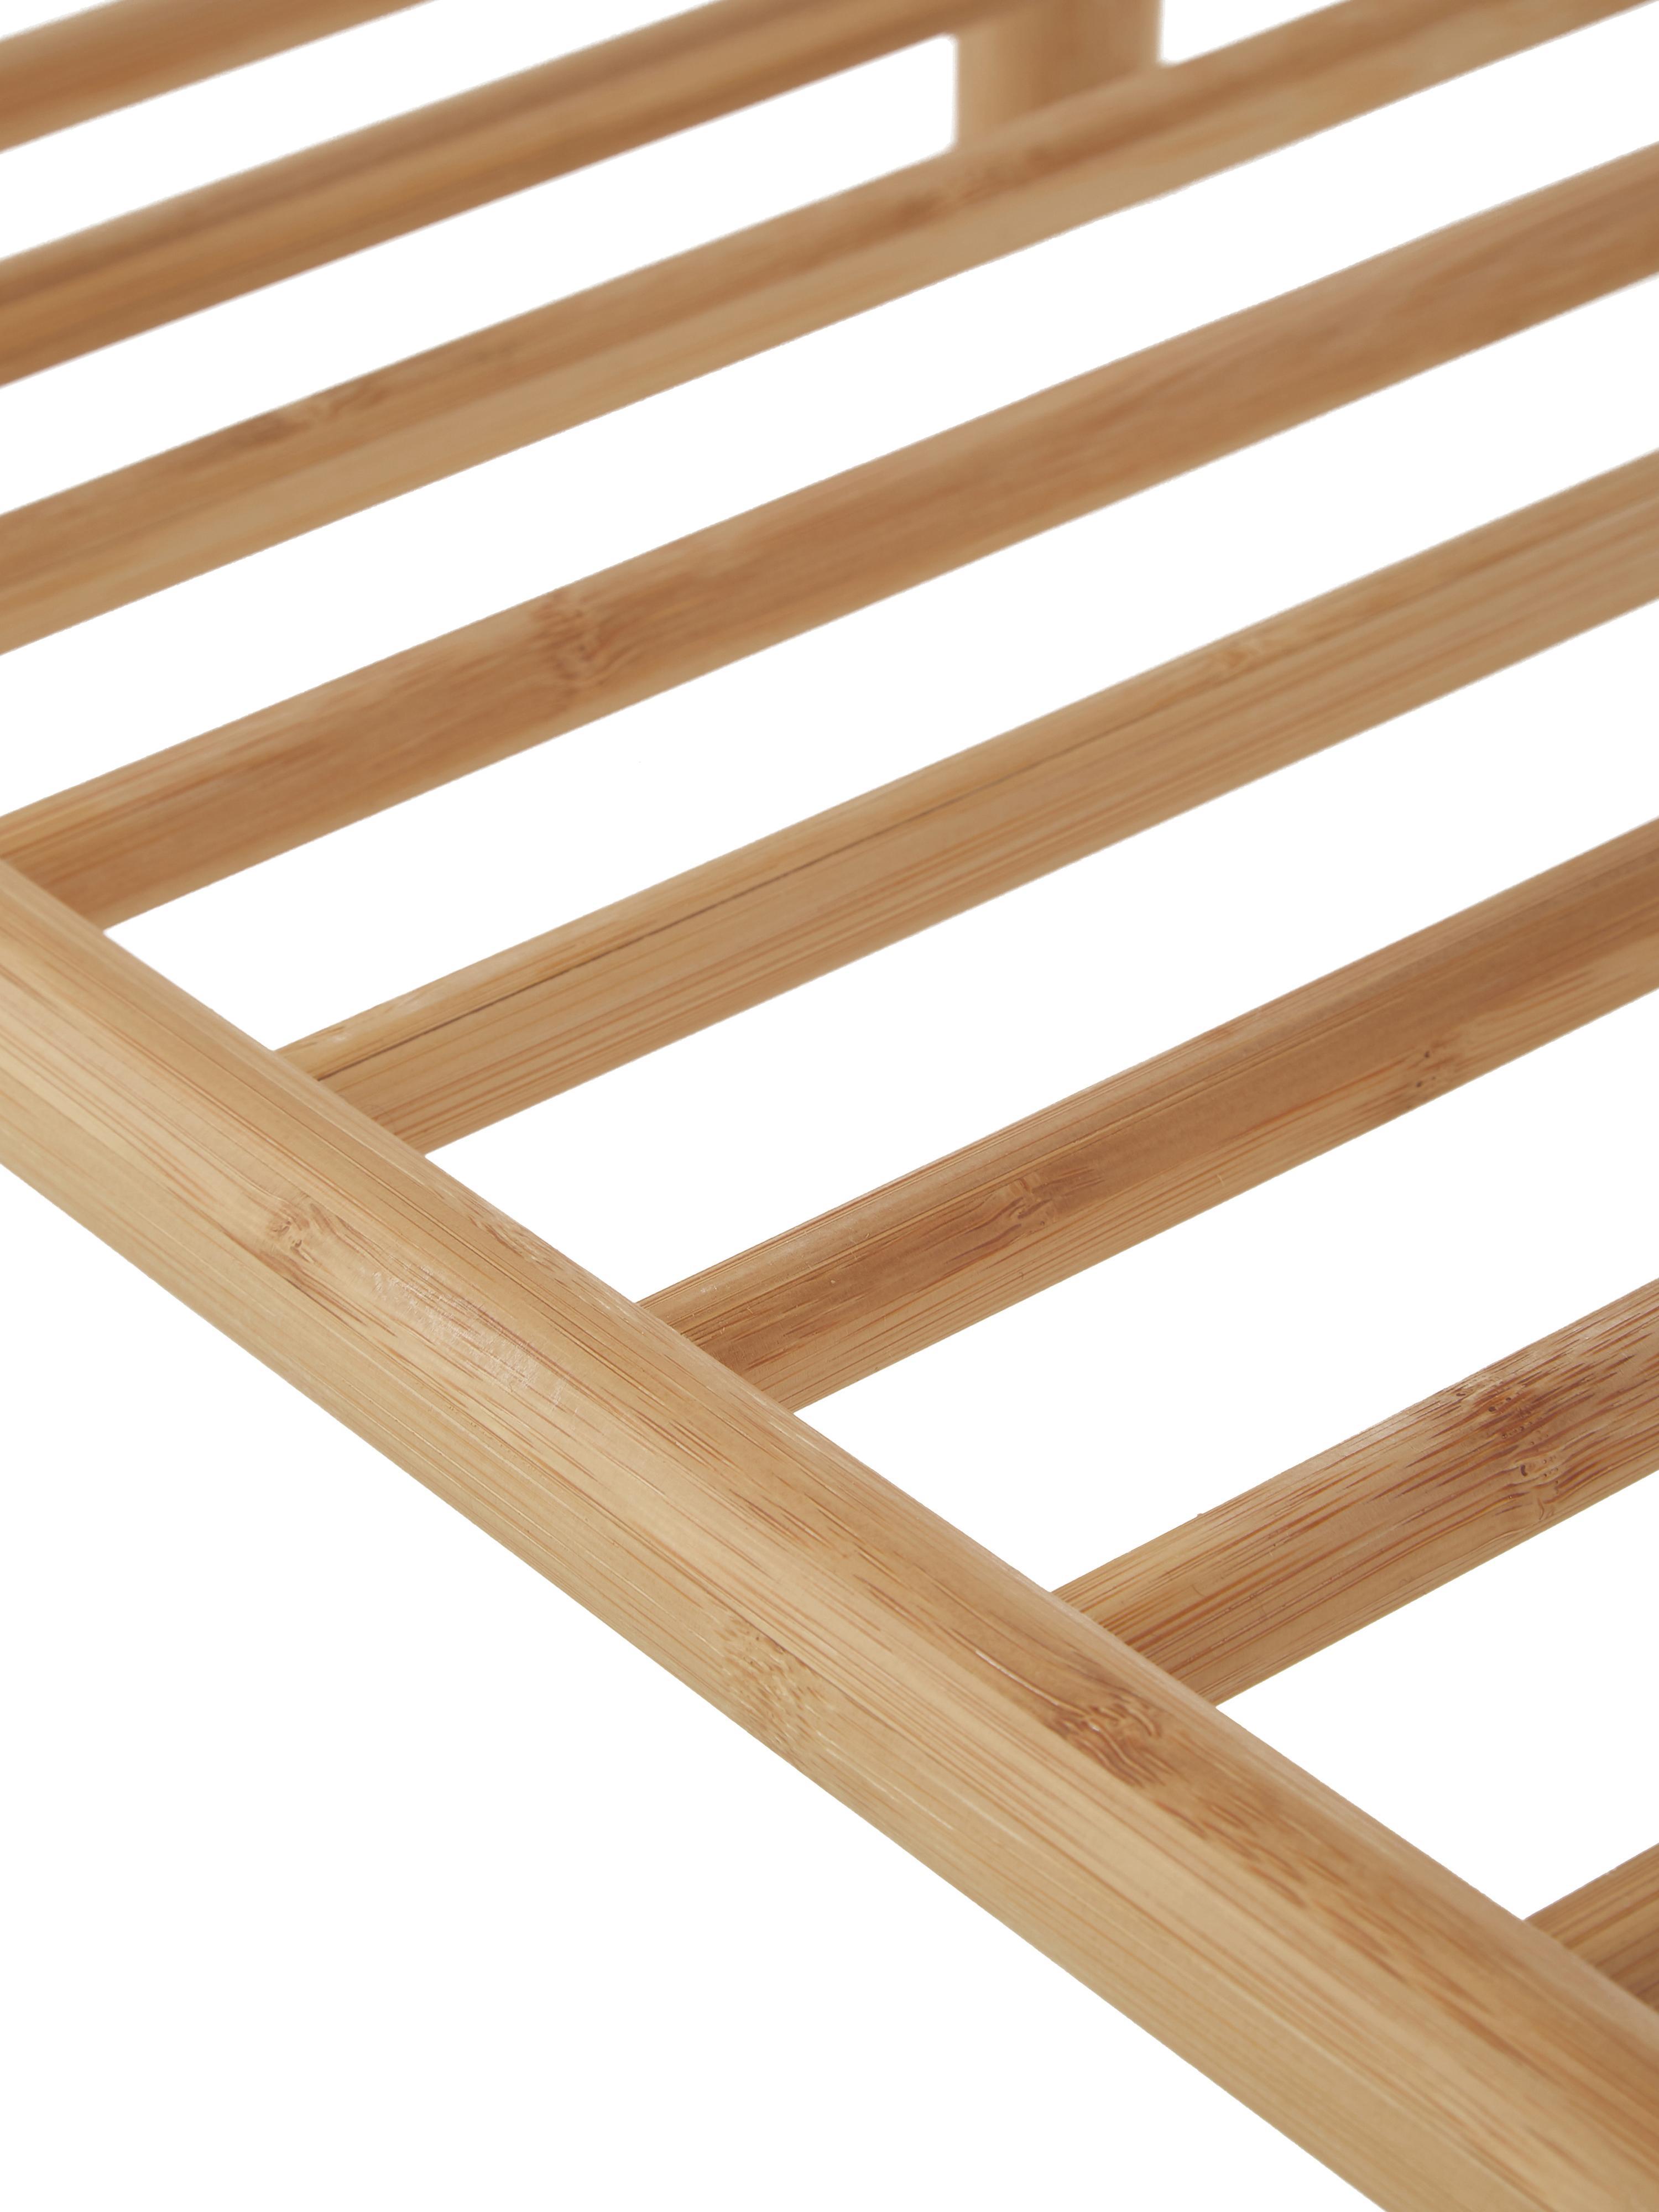 Bambus-Bank Noble, Bambus, geschliffen und geölt, Bambus, 90 x 45 cm